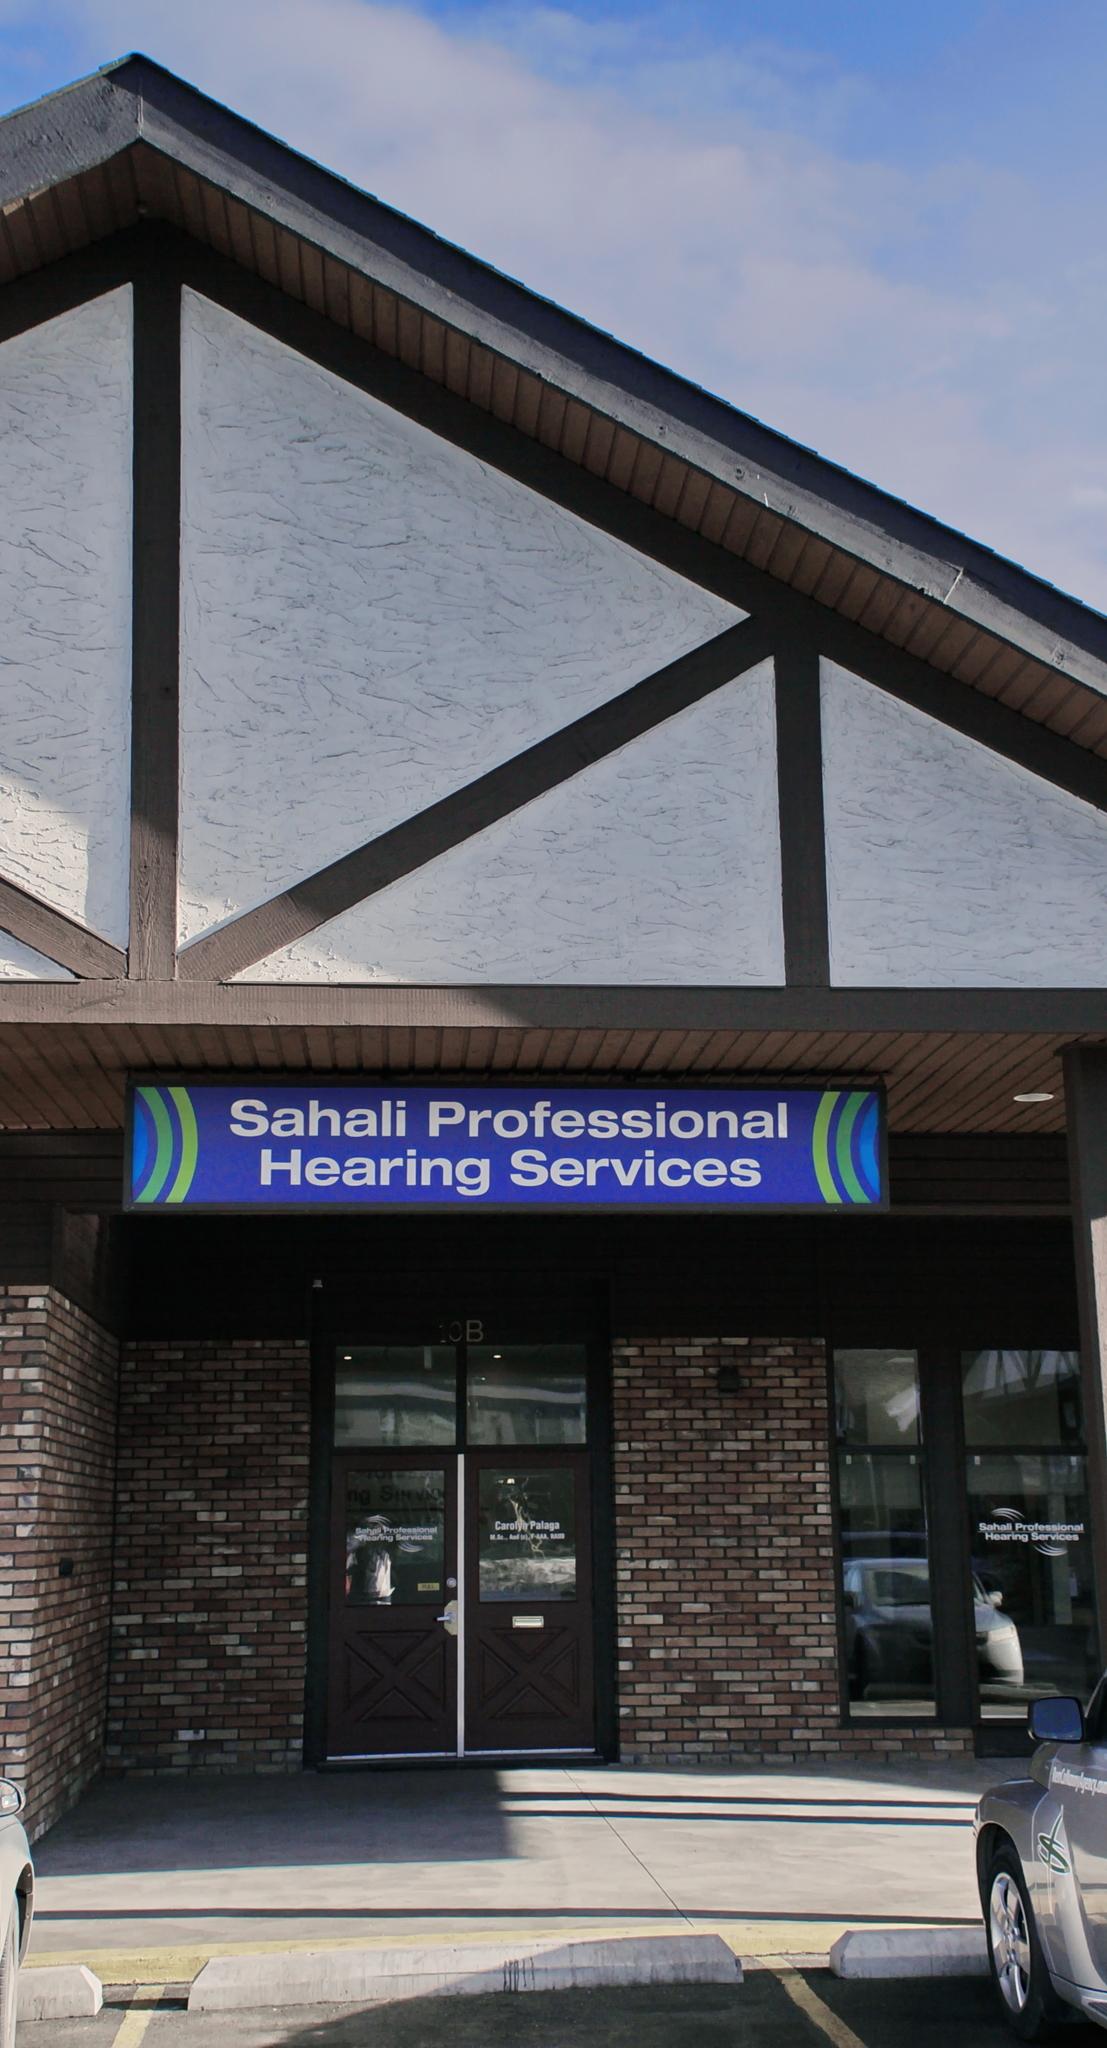 Sahali Professional Hearing Services in Kamloops